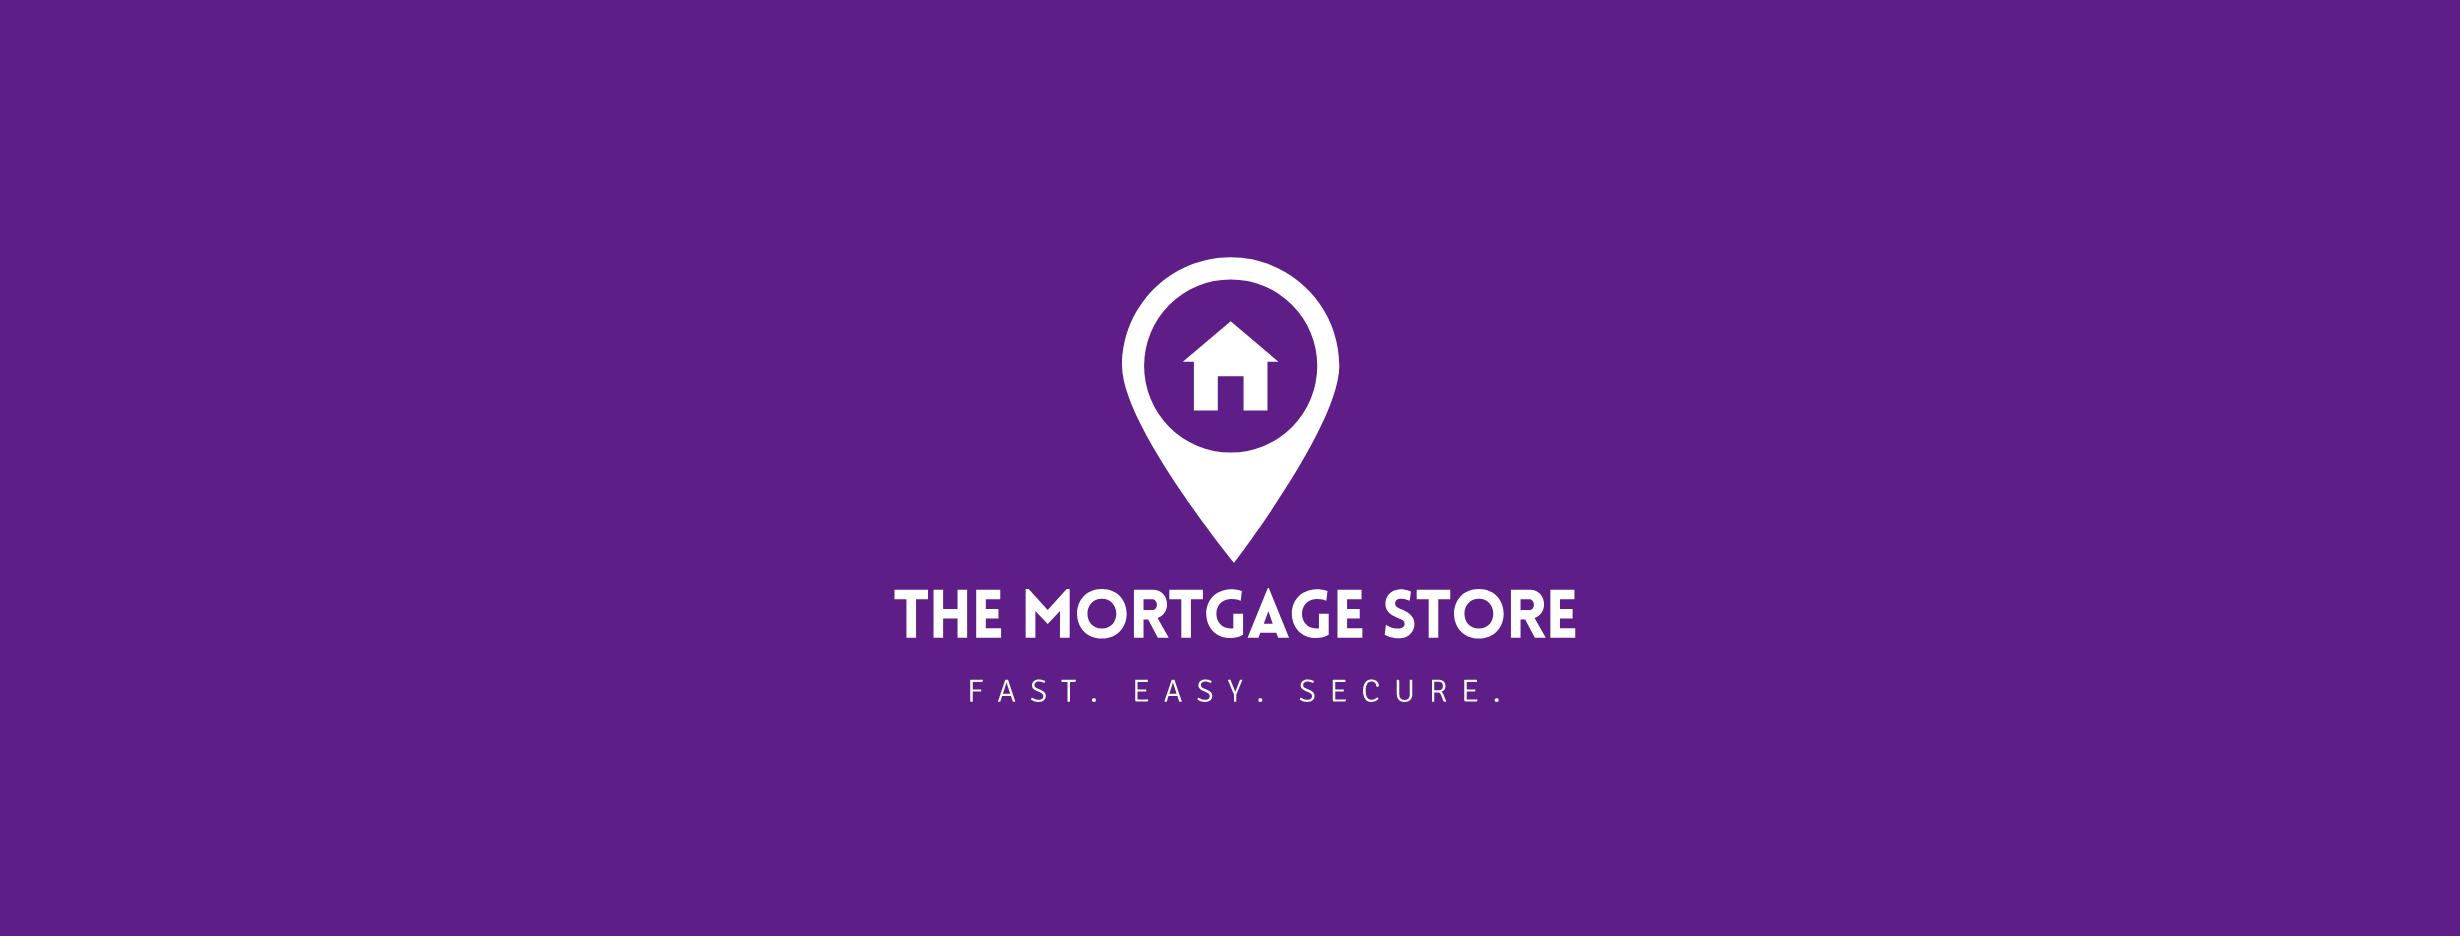 Mortgage Store logo